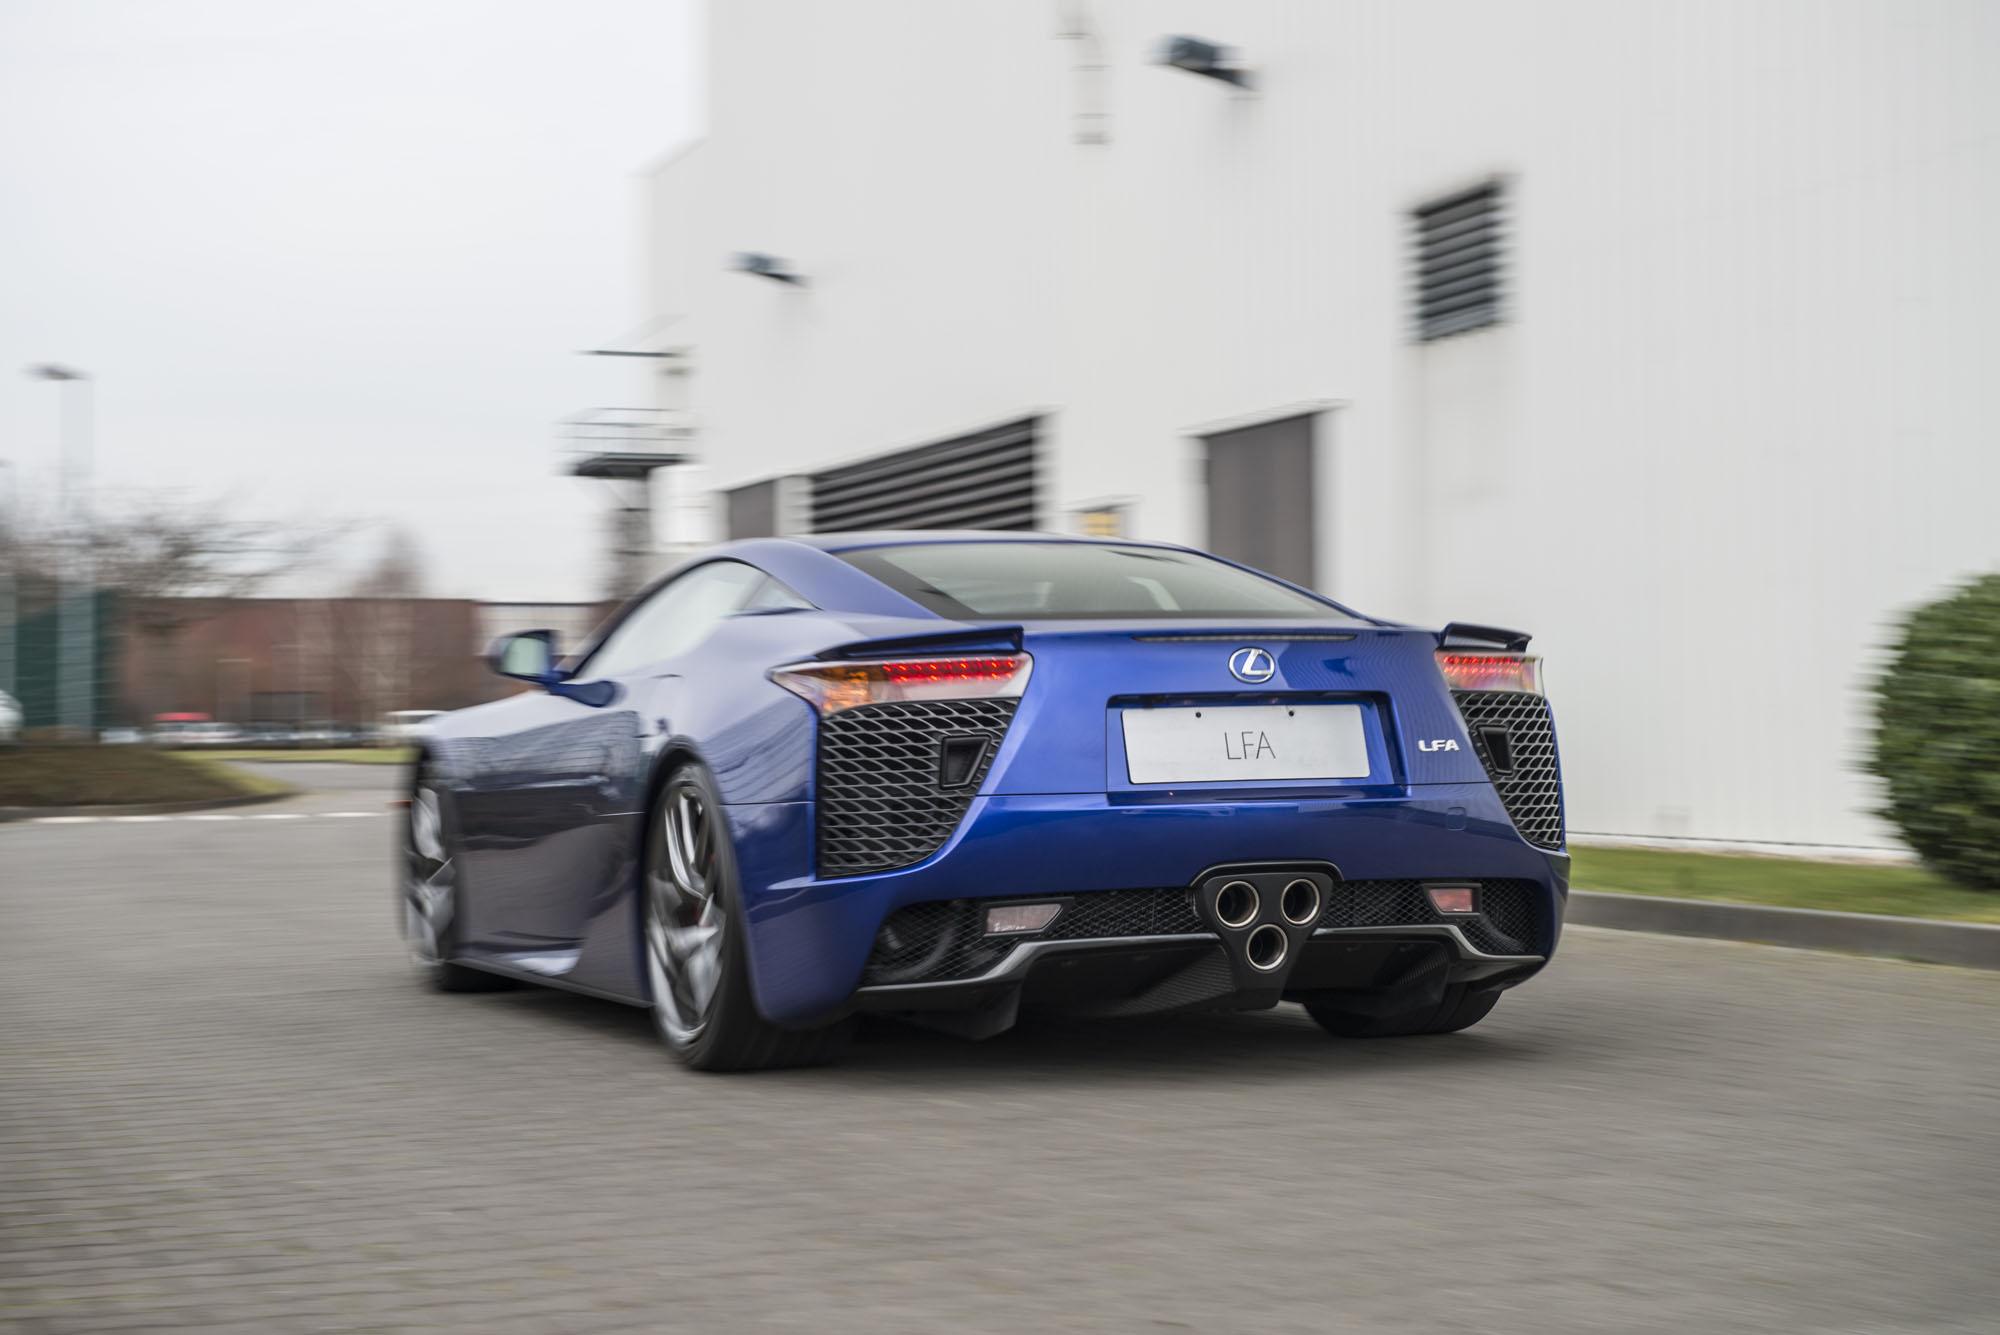 Blue Lexus LFA rear